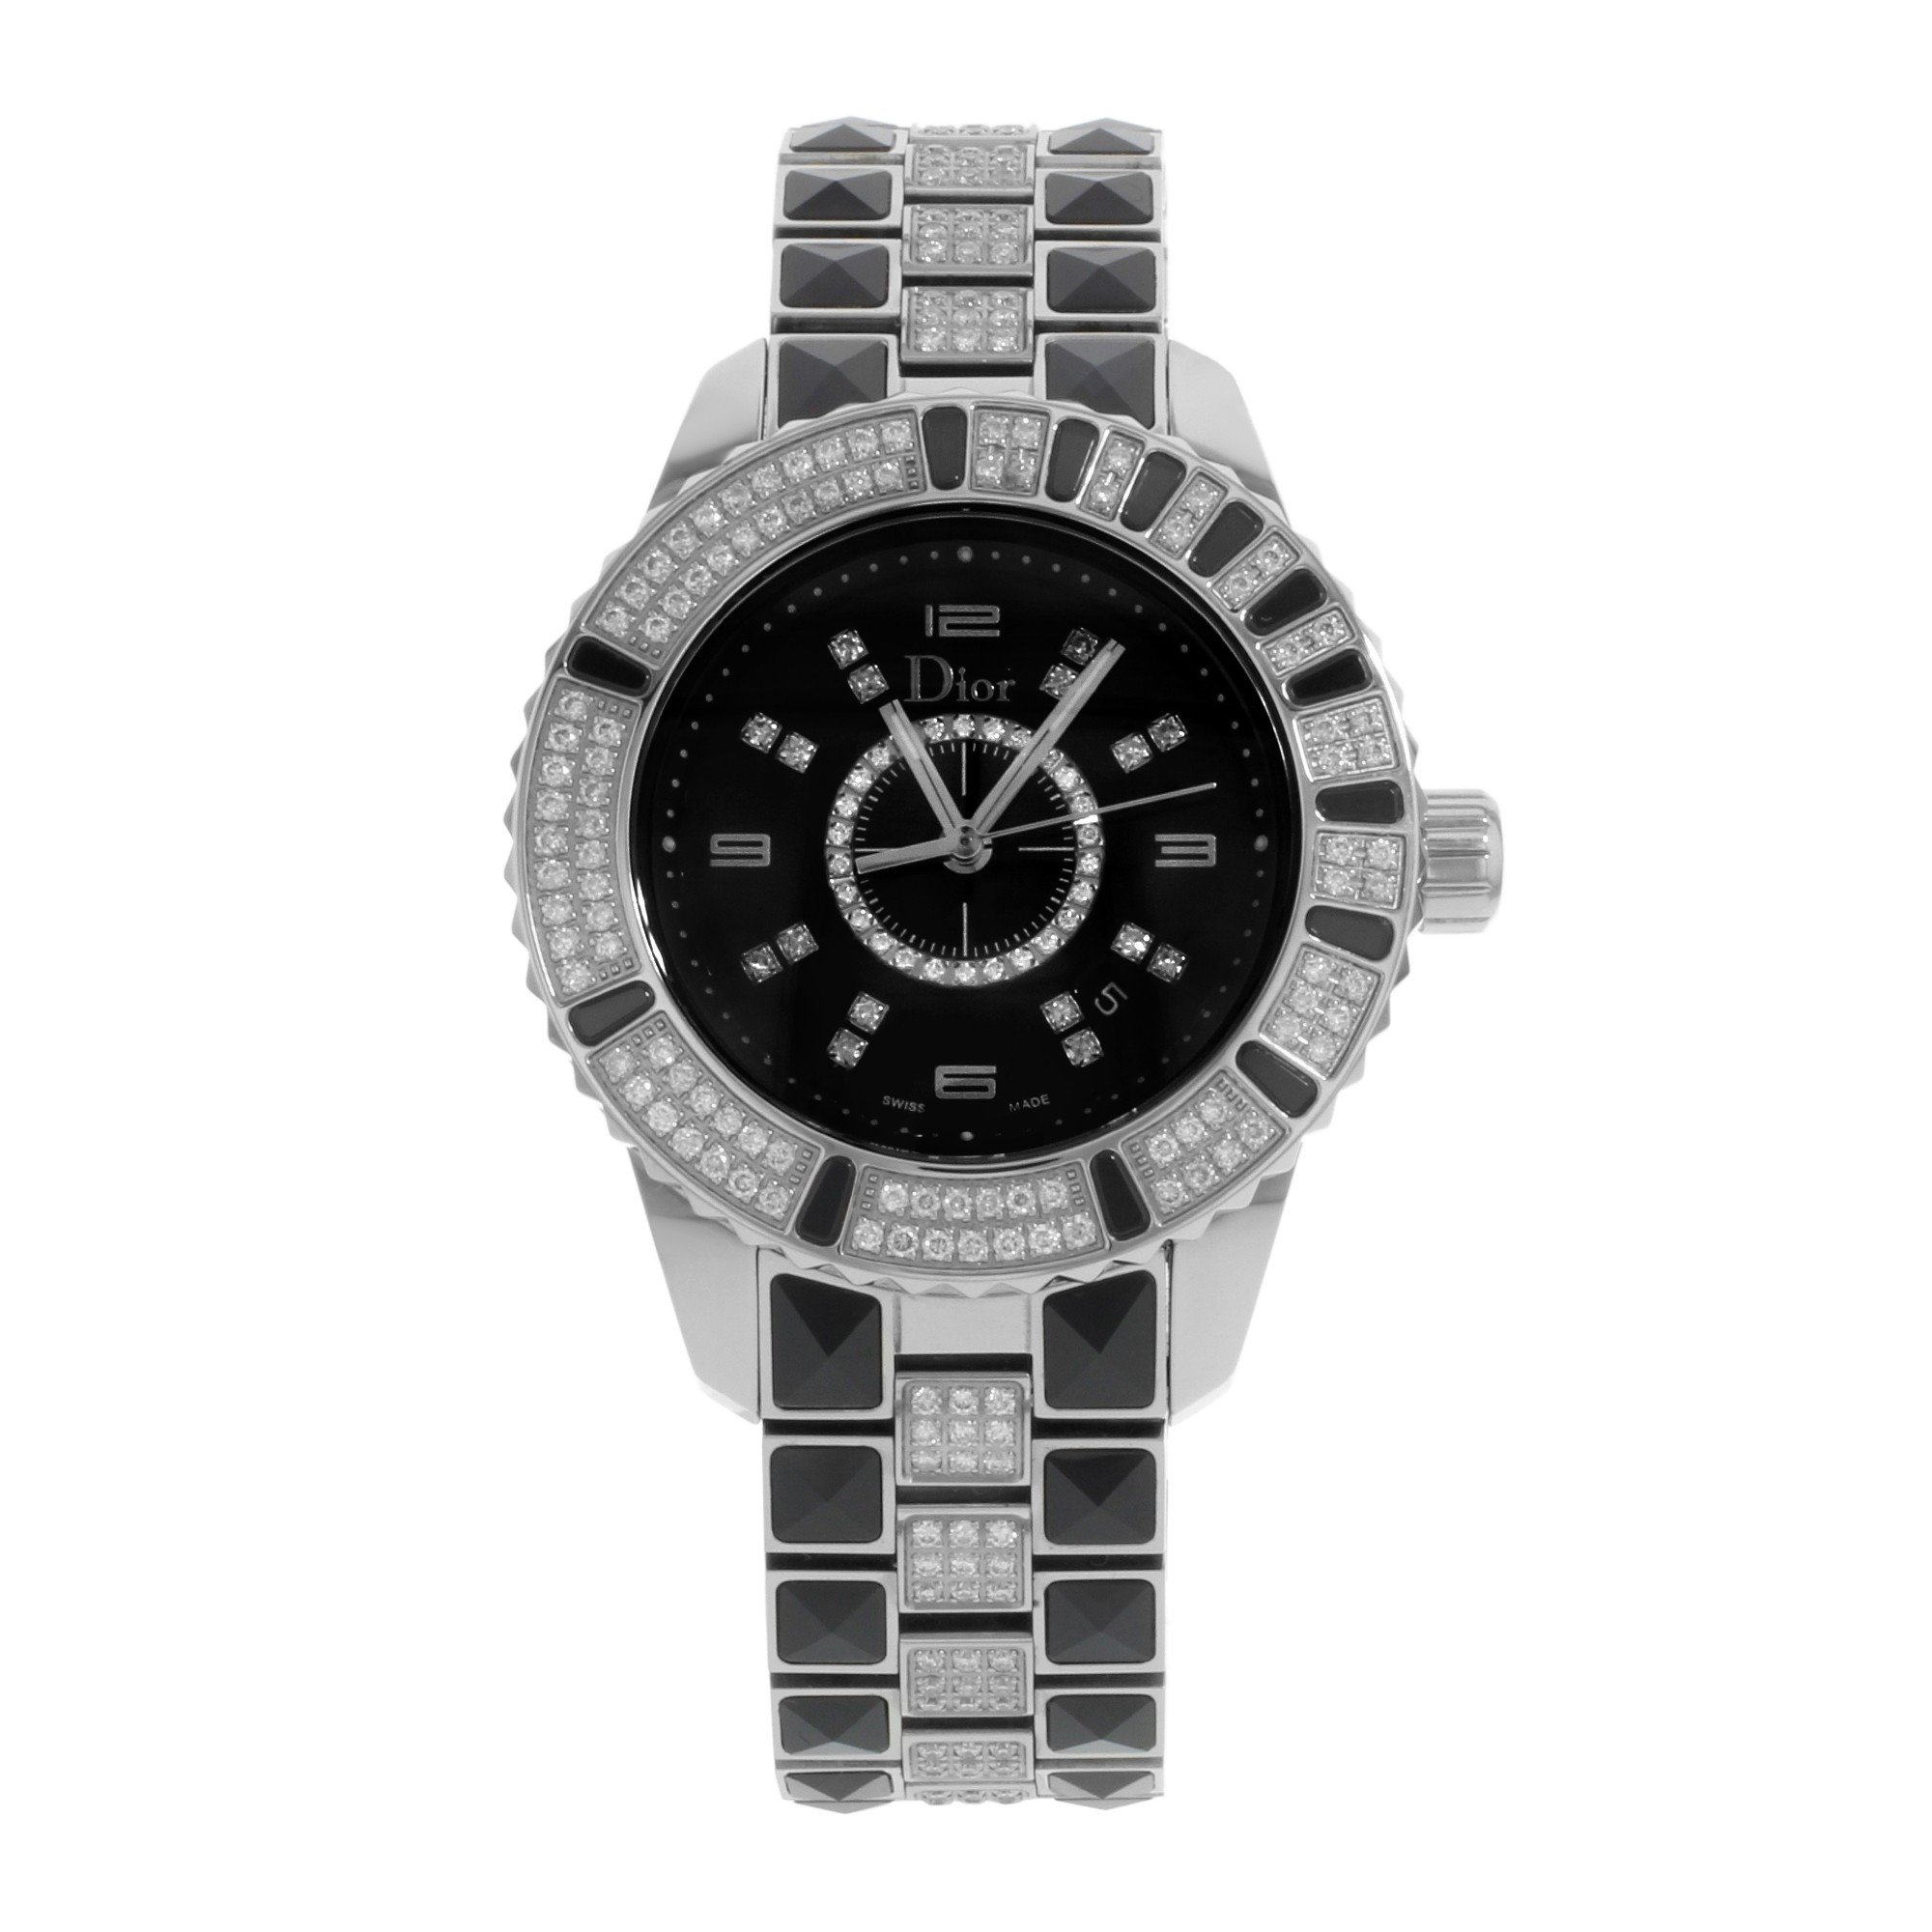 Dior Christal quartz womens Watch CD11311DM001 (Certified Pre-owned)